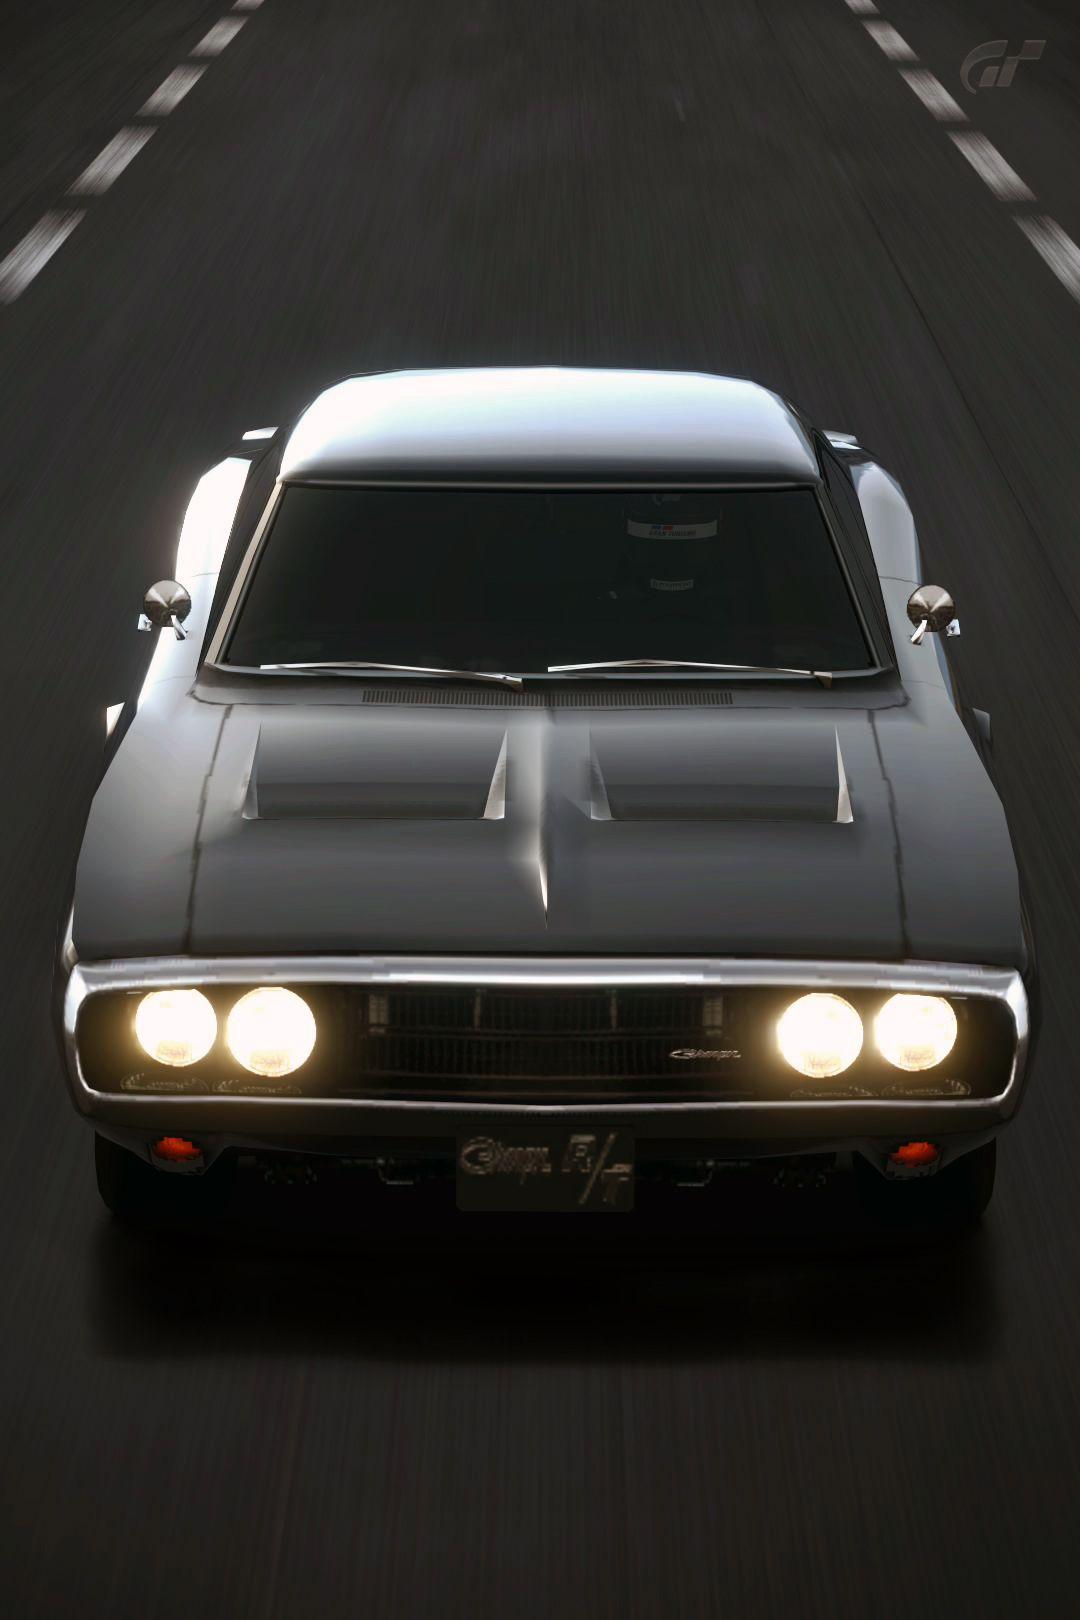 69 Charger: 69 Dodge Charger Carros T Carros Motos E Dodge